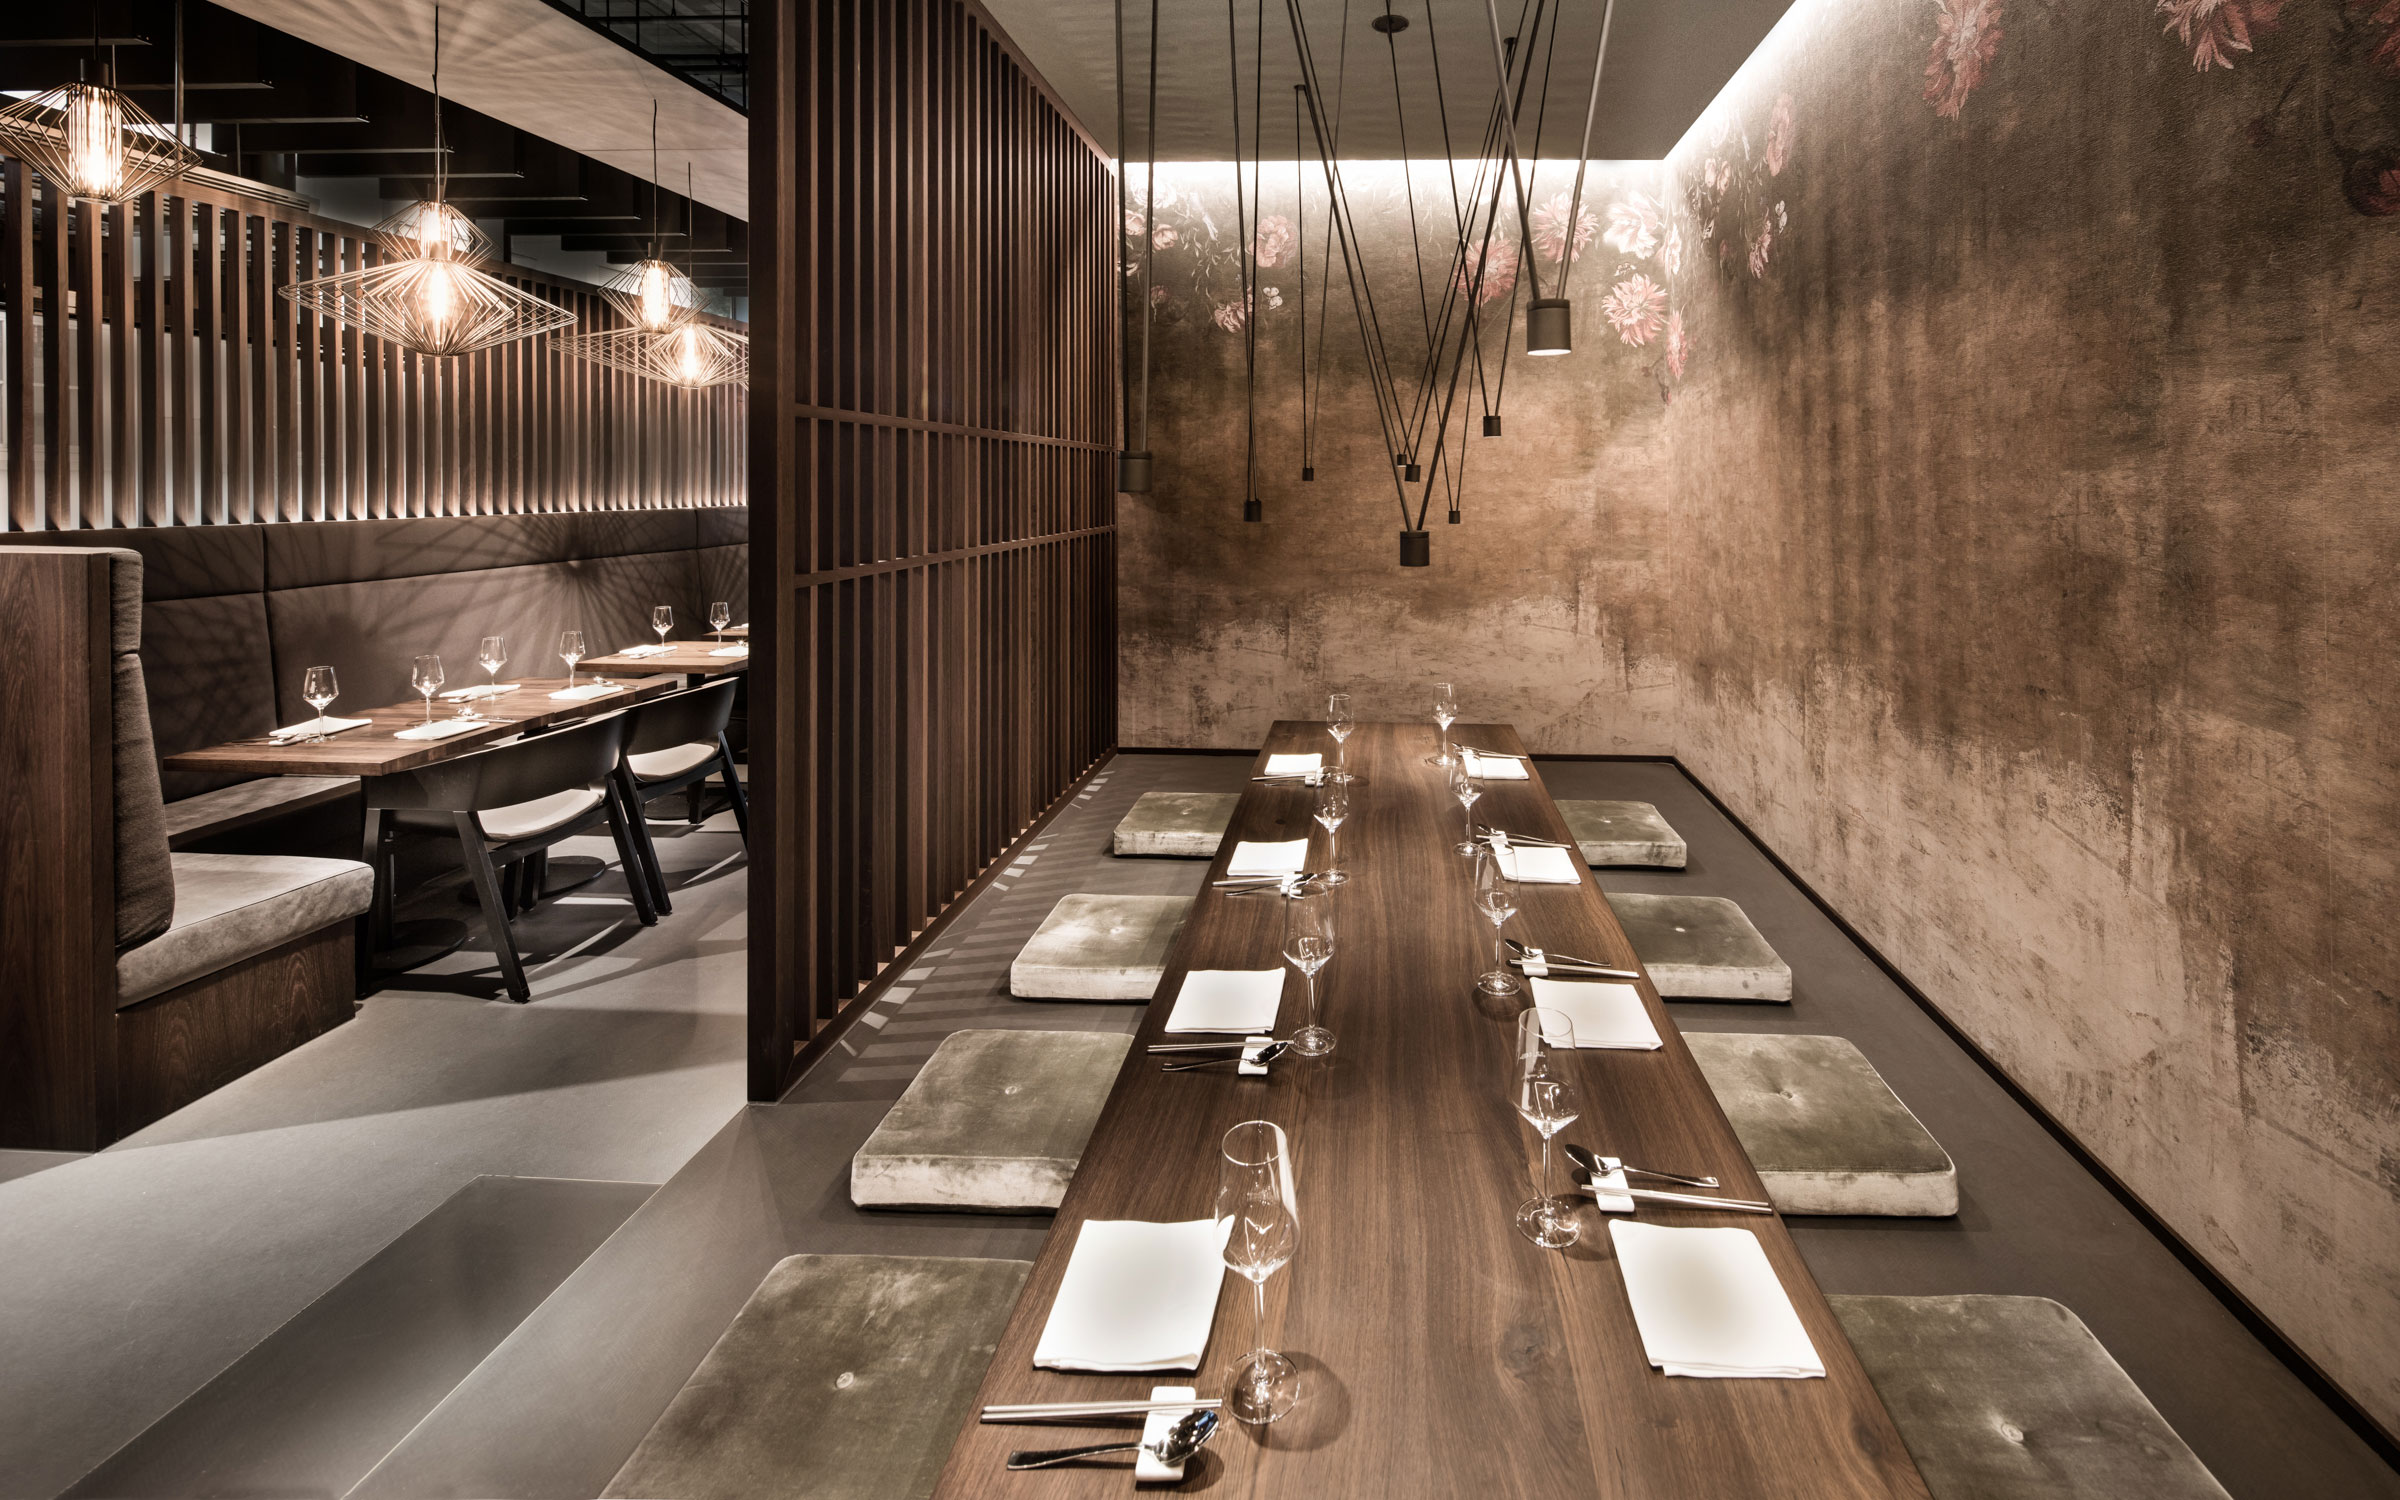 Enso Sushi & Grill, Sitztheke und Sitzecke